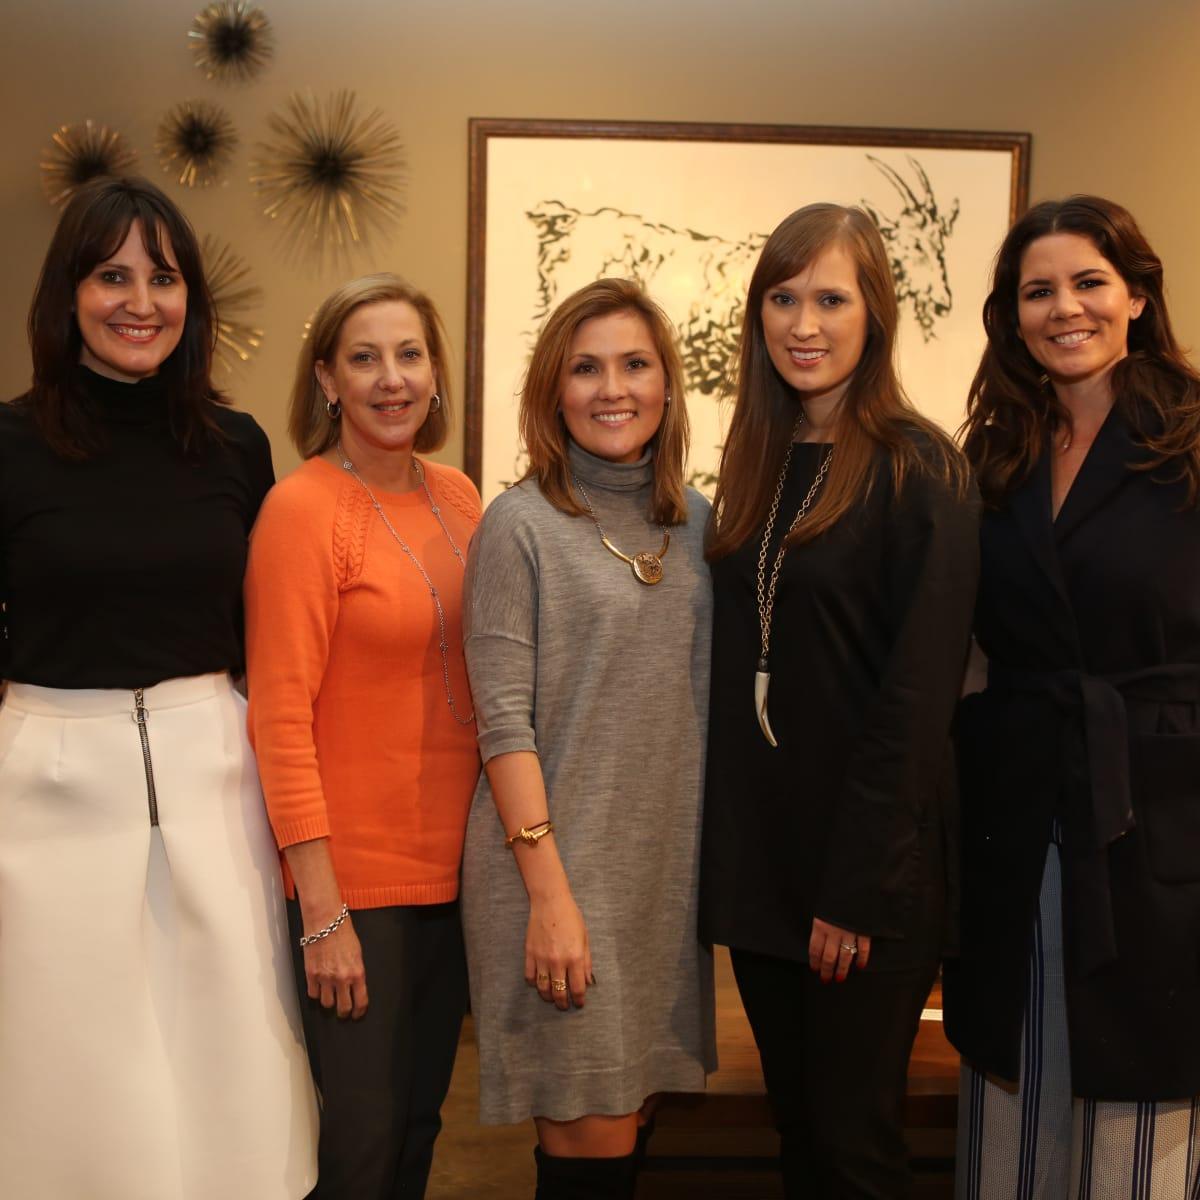 News, Shelby, Decorative Center Houston Fall Market, Nov. 2015, Kate Stukenberg, Martha Lurie, Katie Kime, Meg Lonergan and Paloma Contreras